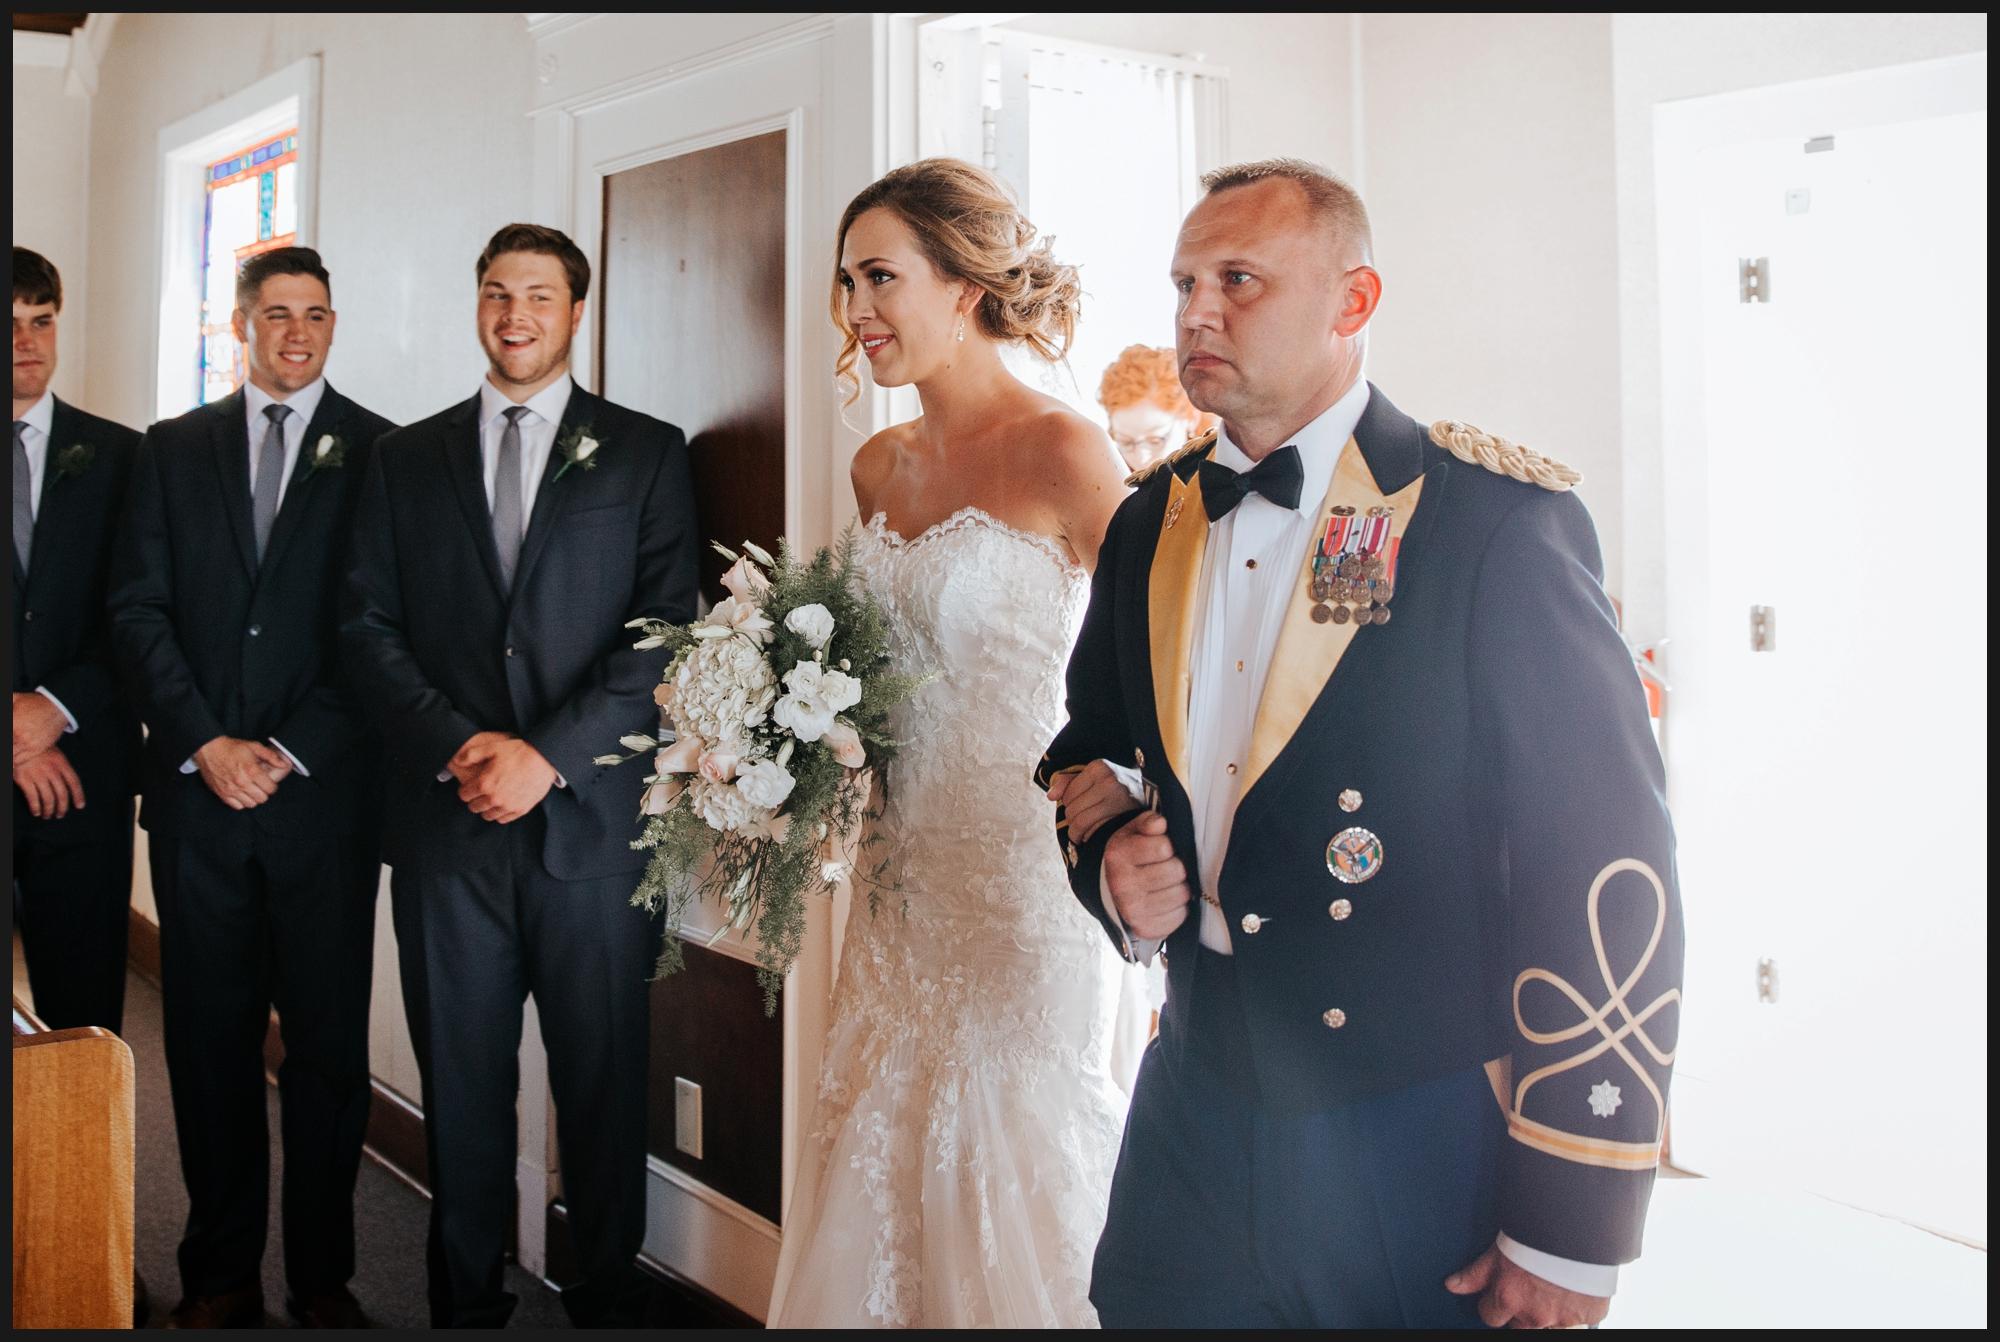 Orlando-Wedding-Photographer-destination-wedding-photographer-florida-wedding-photographer-bohemian-wedding-photographer_0068.jpg